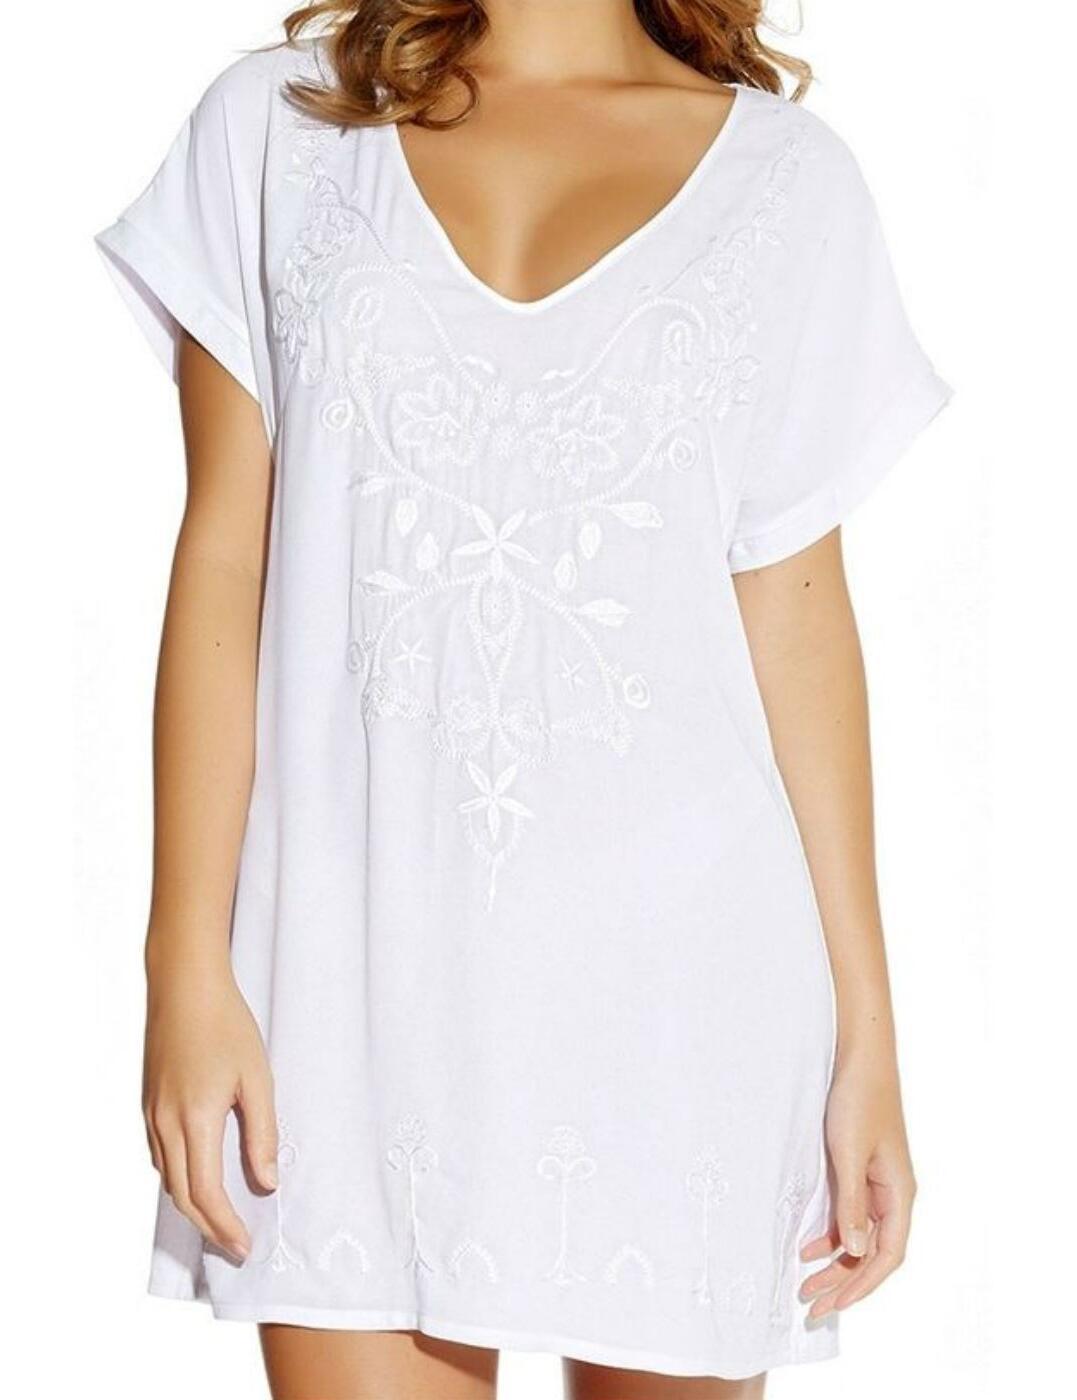 5031 Fantasie Thea Embroidered Beach Tunic Dress - 5031 White